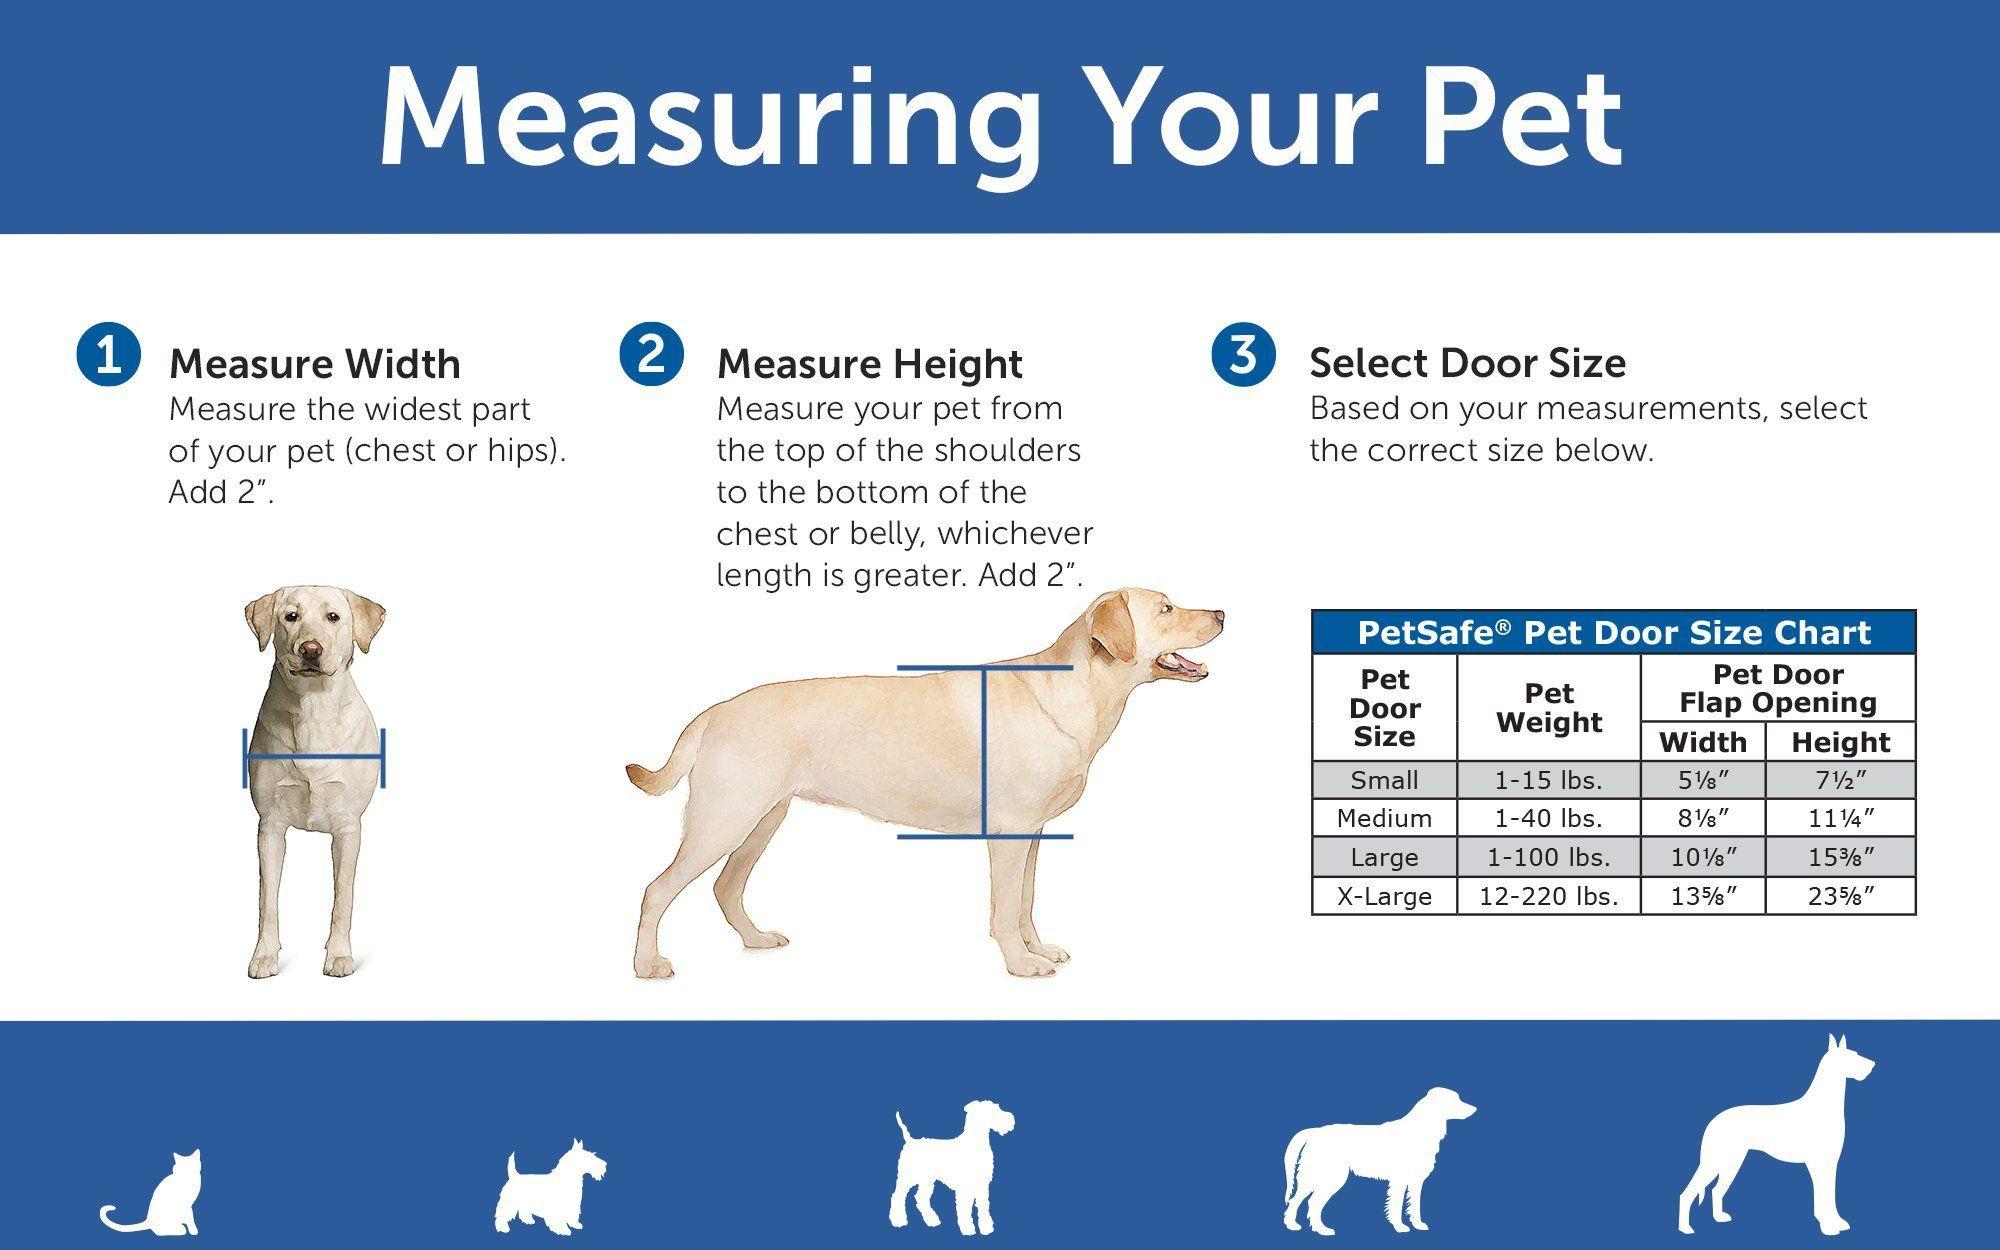 Petsafe Plastic Pet Door Small With Soft Tinted Flap Paintable White Frame For Dogs Under 15 Lb Click Image For More Details I Dog Door Pet Door Cat Door